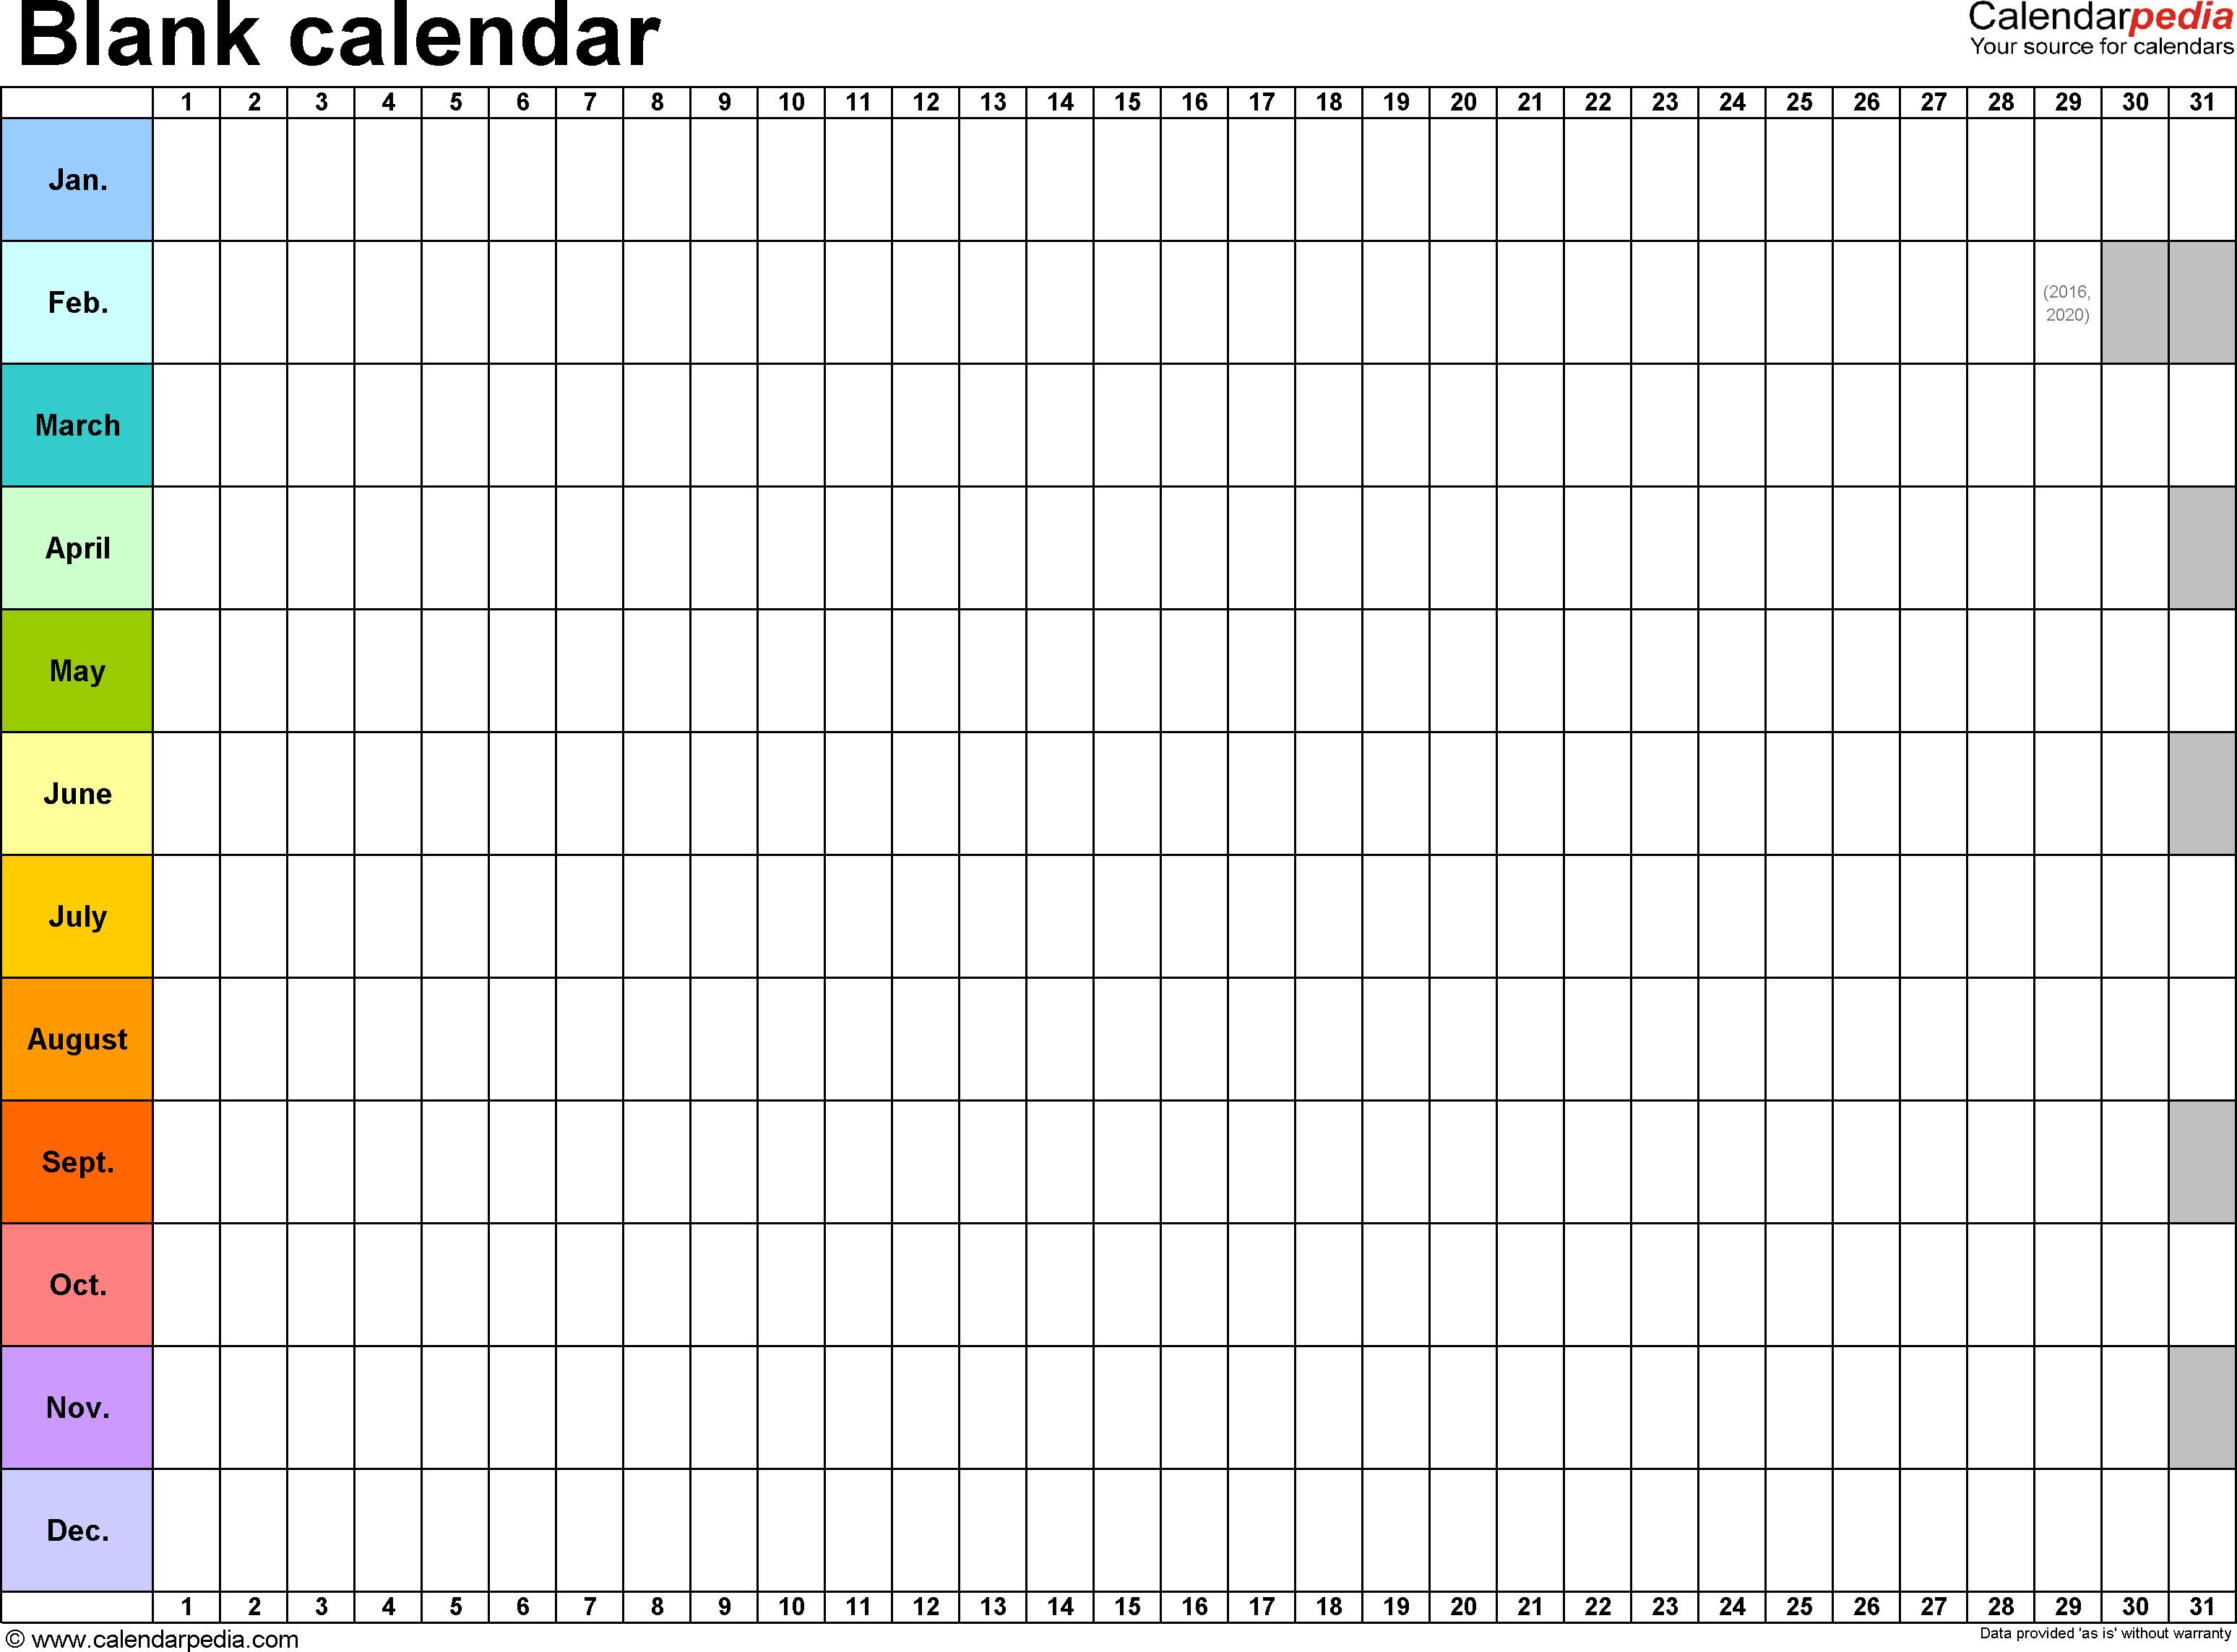 Blank Calendar - 9 Free Printable Microsoft Word Templates inside Blank Calendar Printable December Template